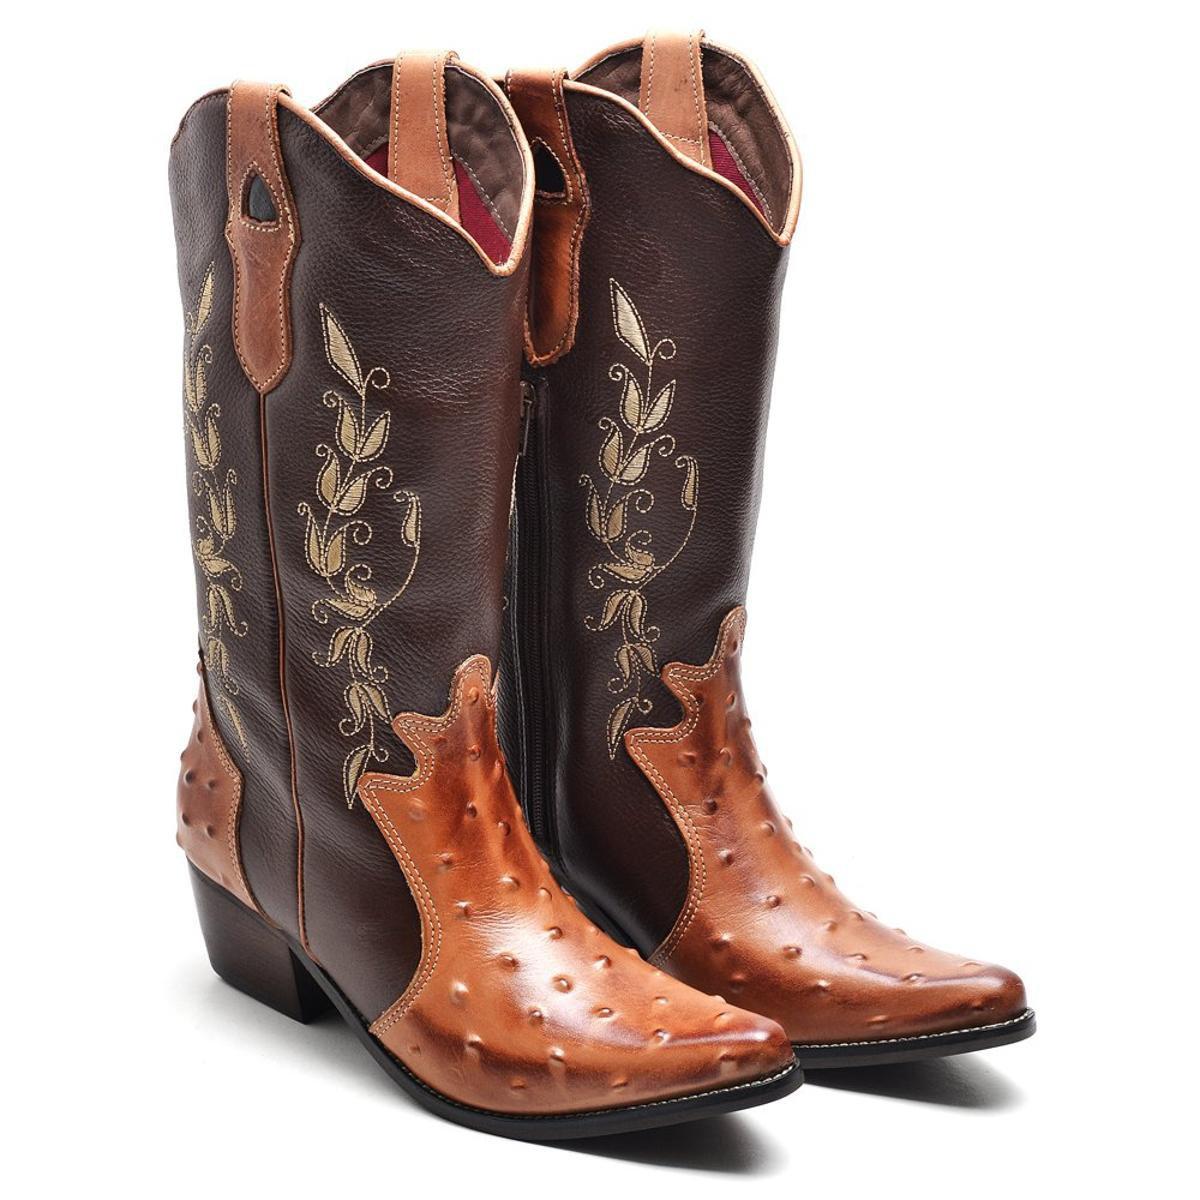 Bota Country Bico Fino Top Franca Shoes Feminina - Dourado e Marrom ...  555f94360ccc8d  Top Franca Shoes Impecável Sapato Social Masculino Couro ... c869aa9bbc6